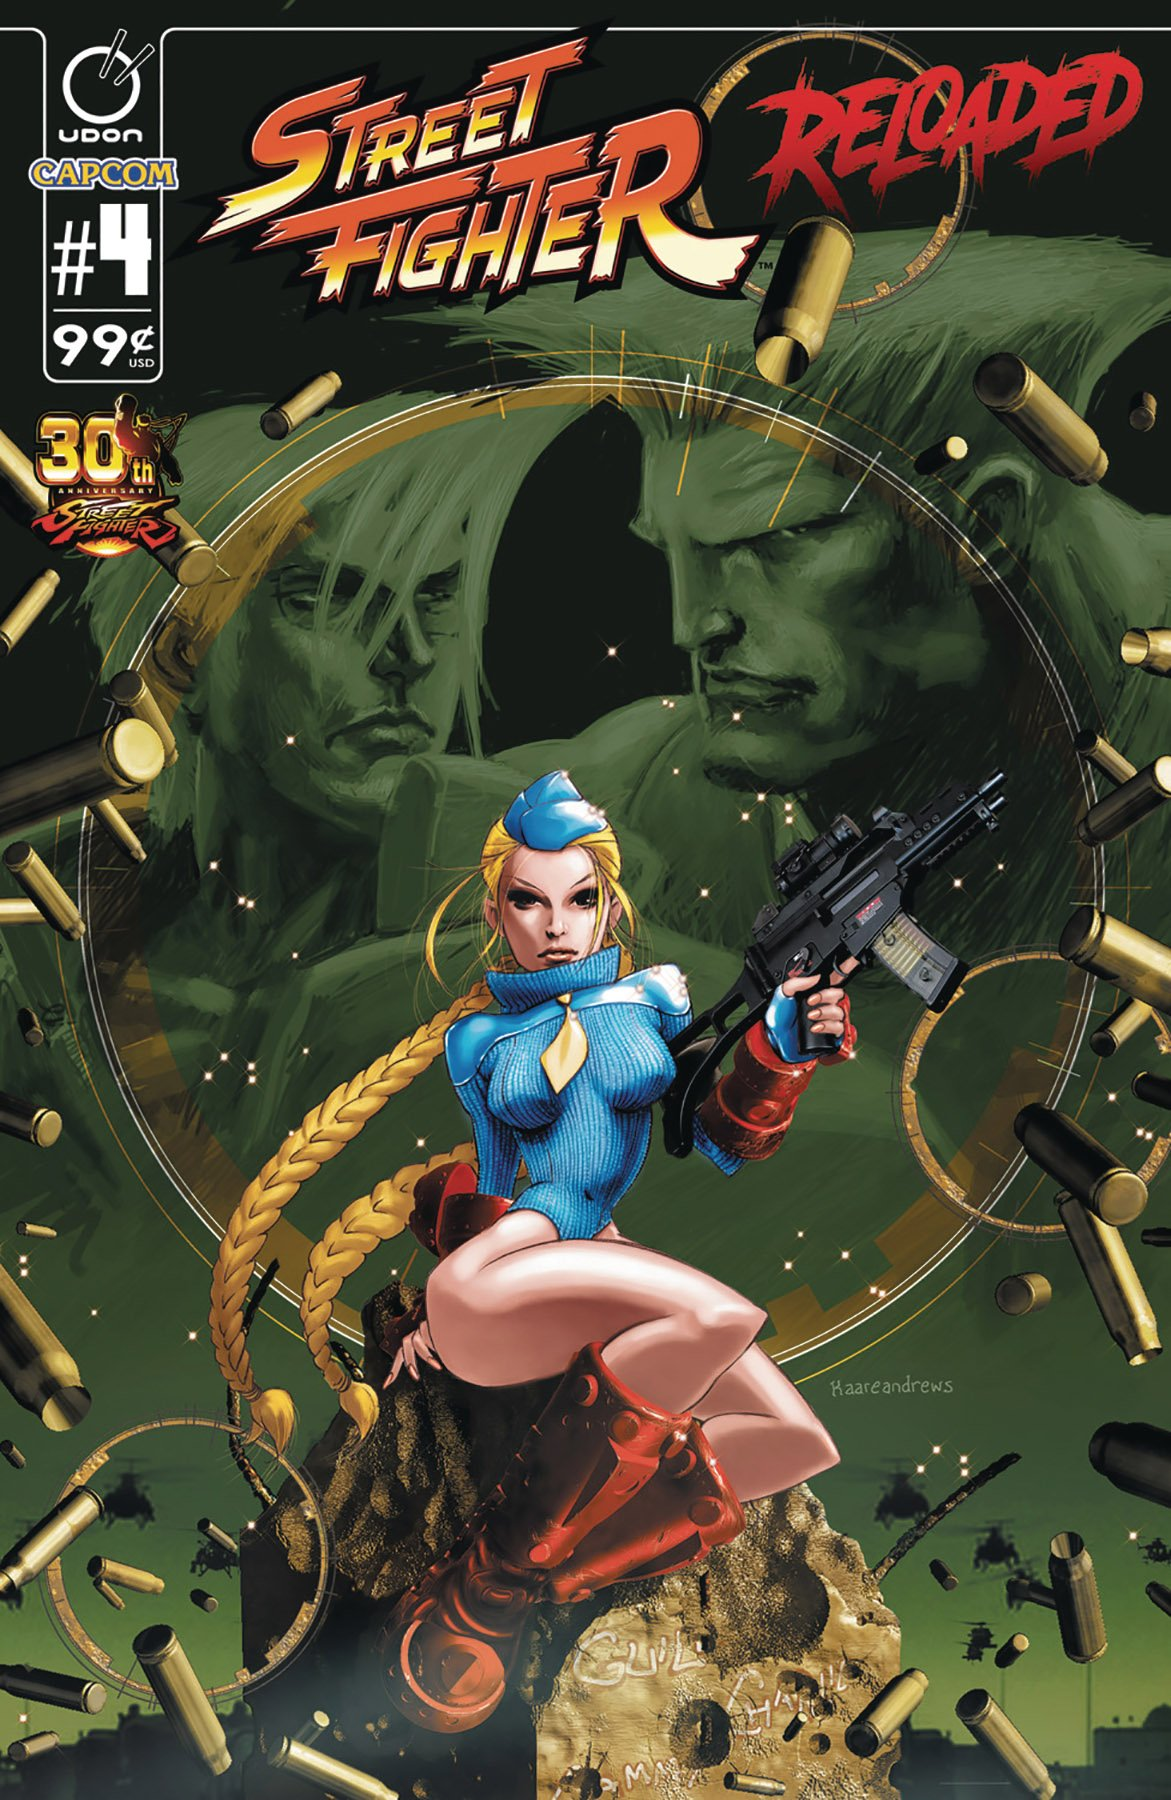 Street Fighter Reloaded 04